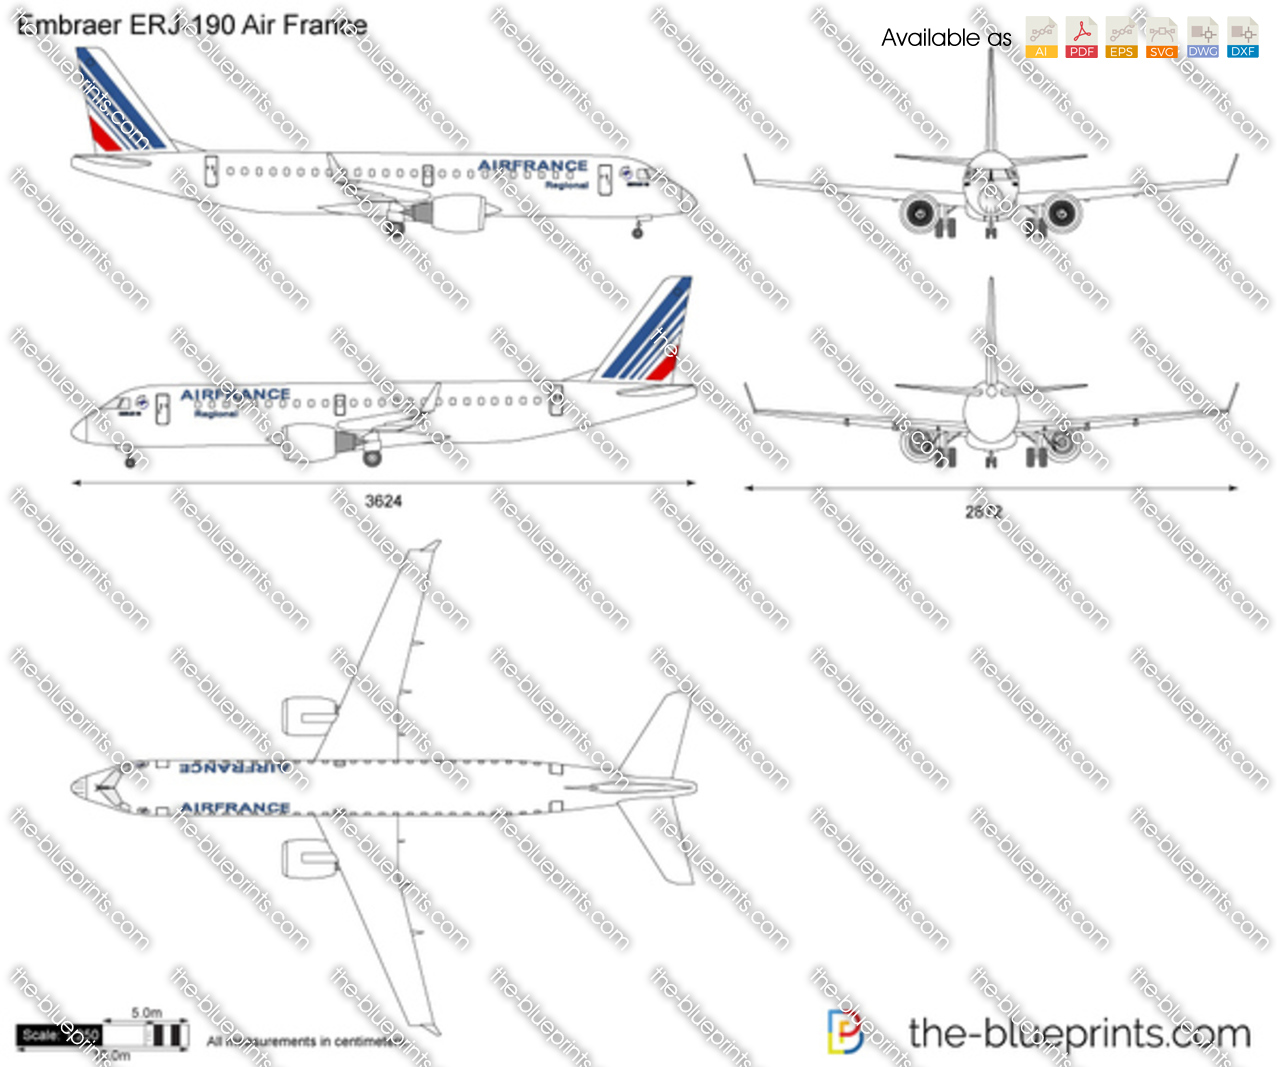 Embraer ERJ-190 Air France